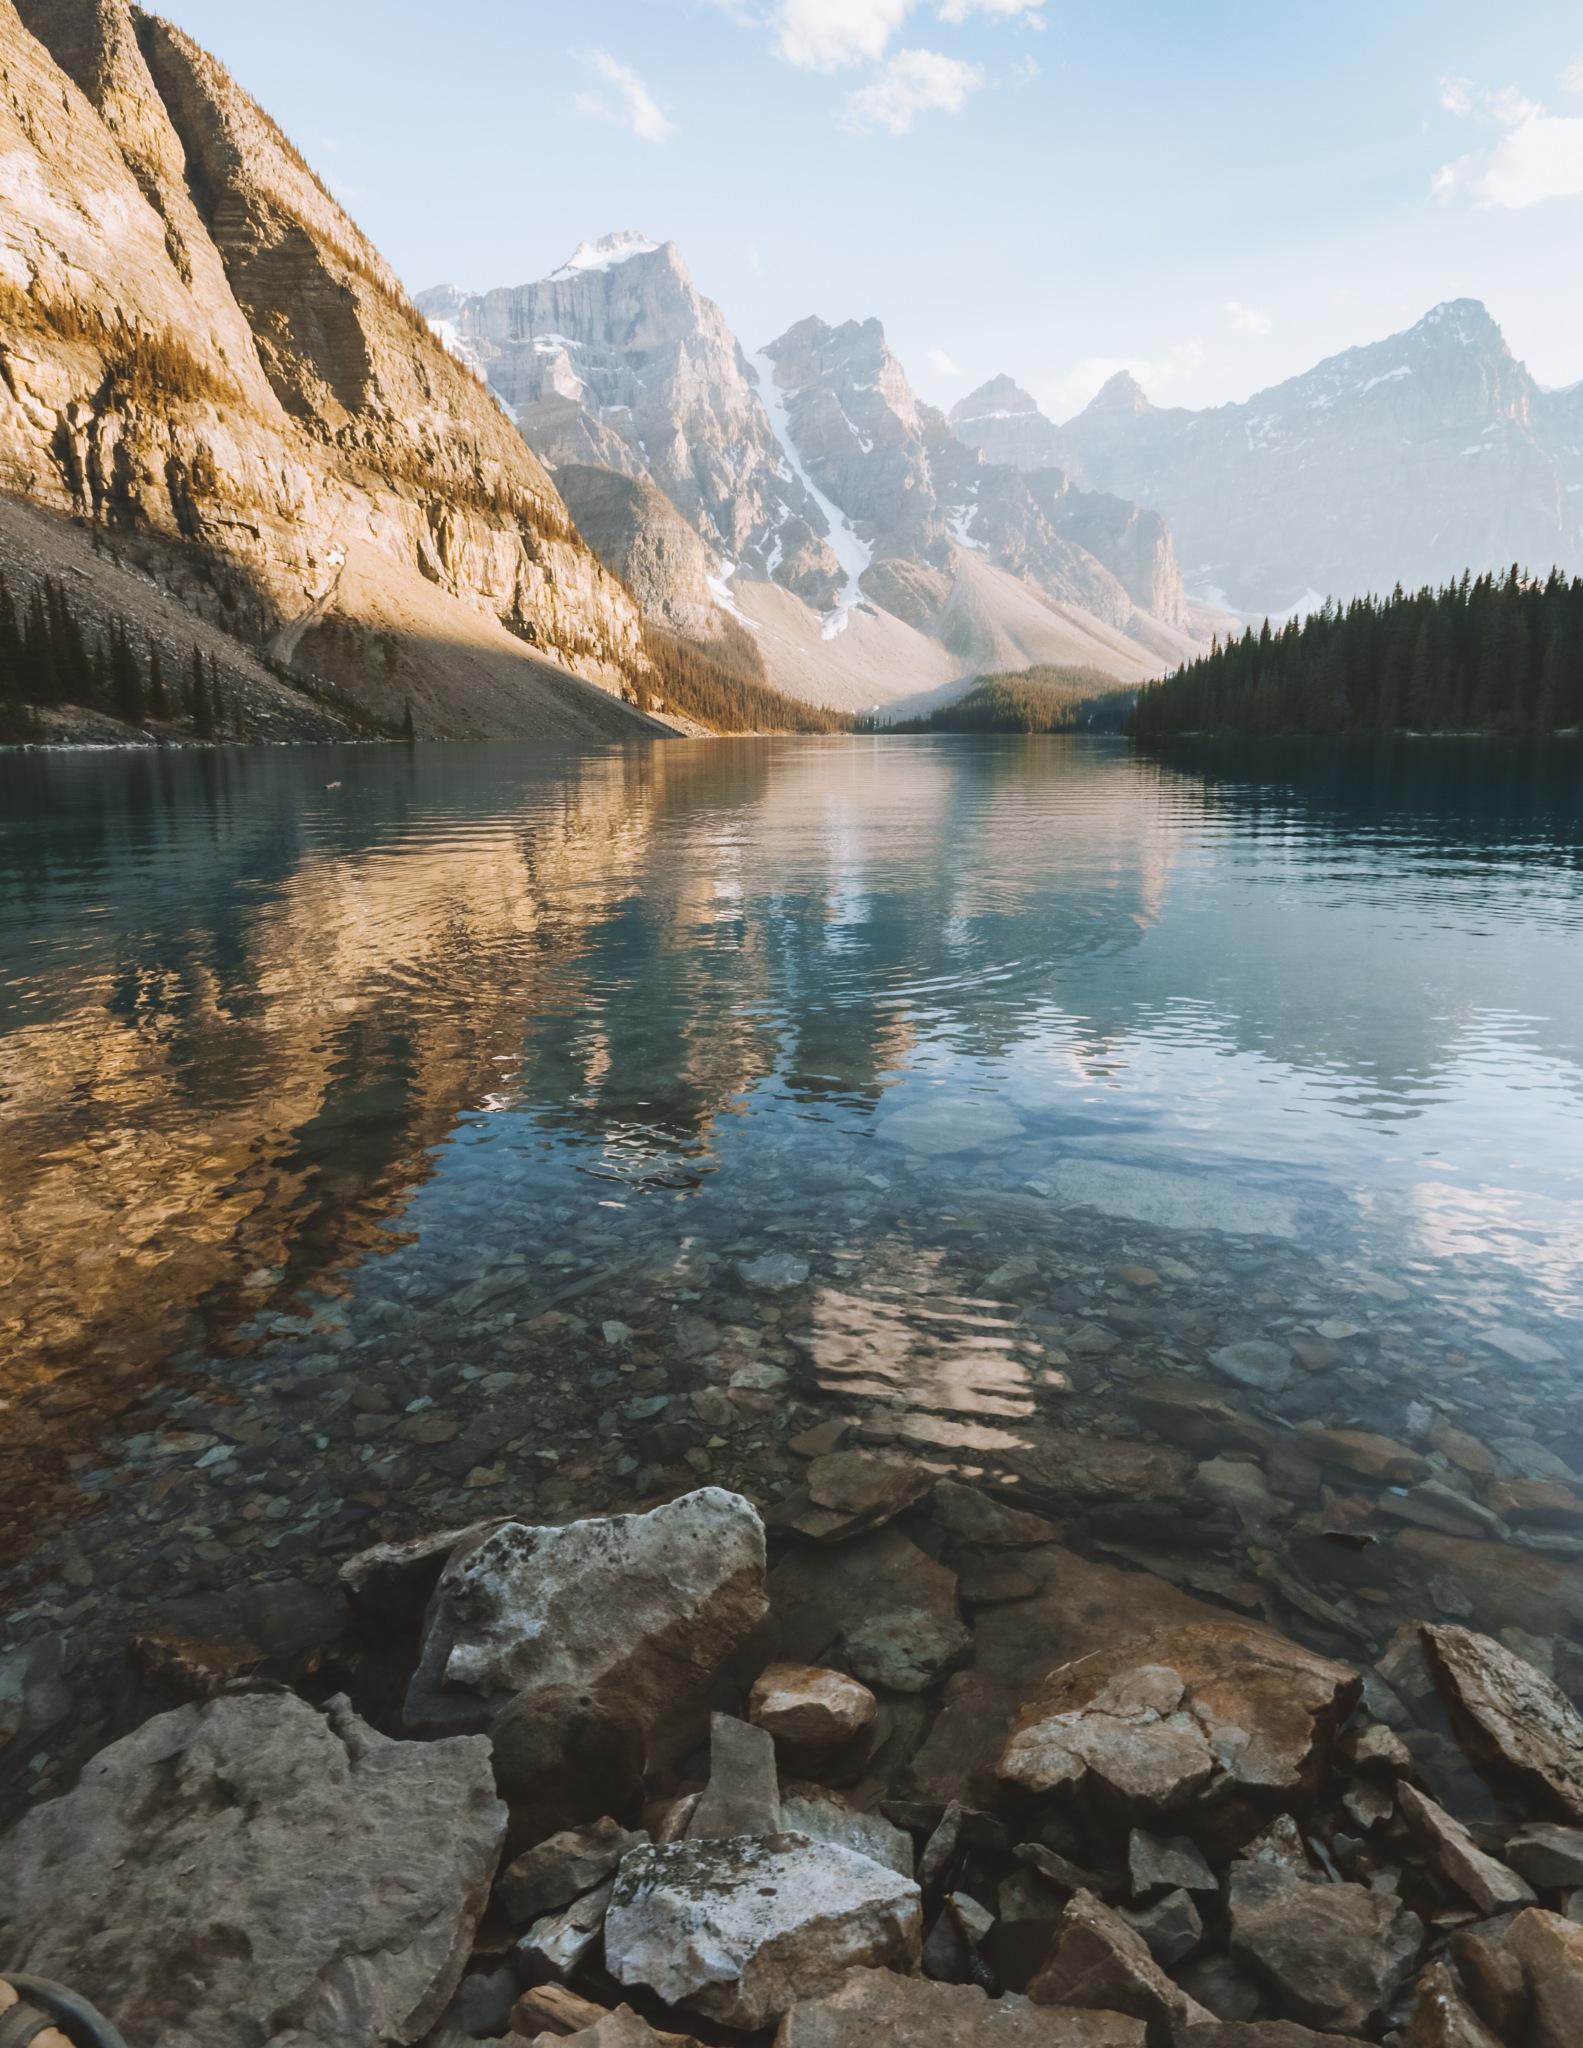 Calm Moraine Lake by josiahtbonner